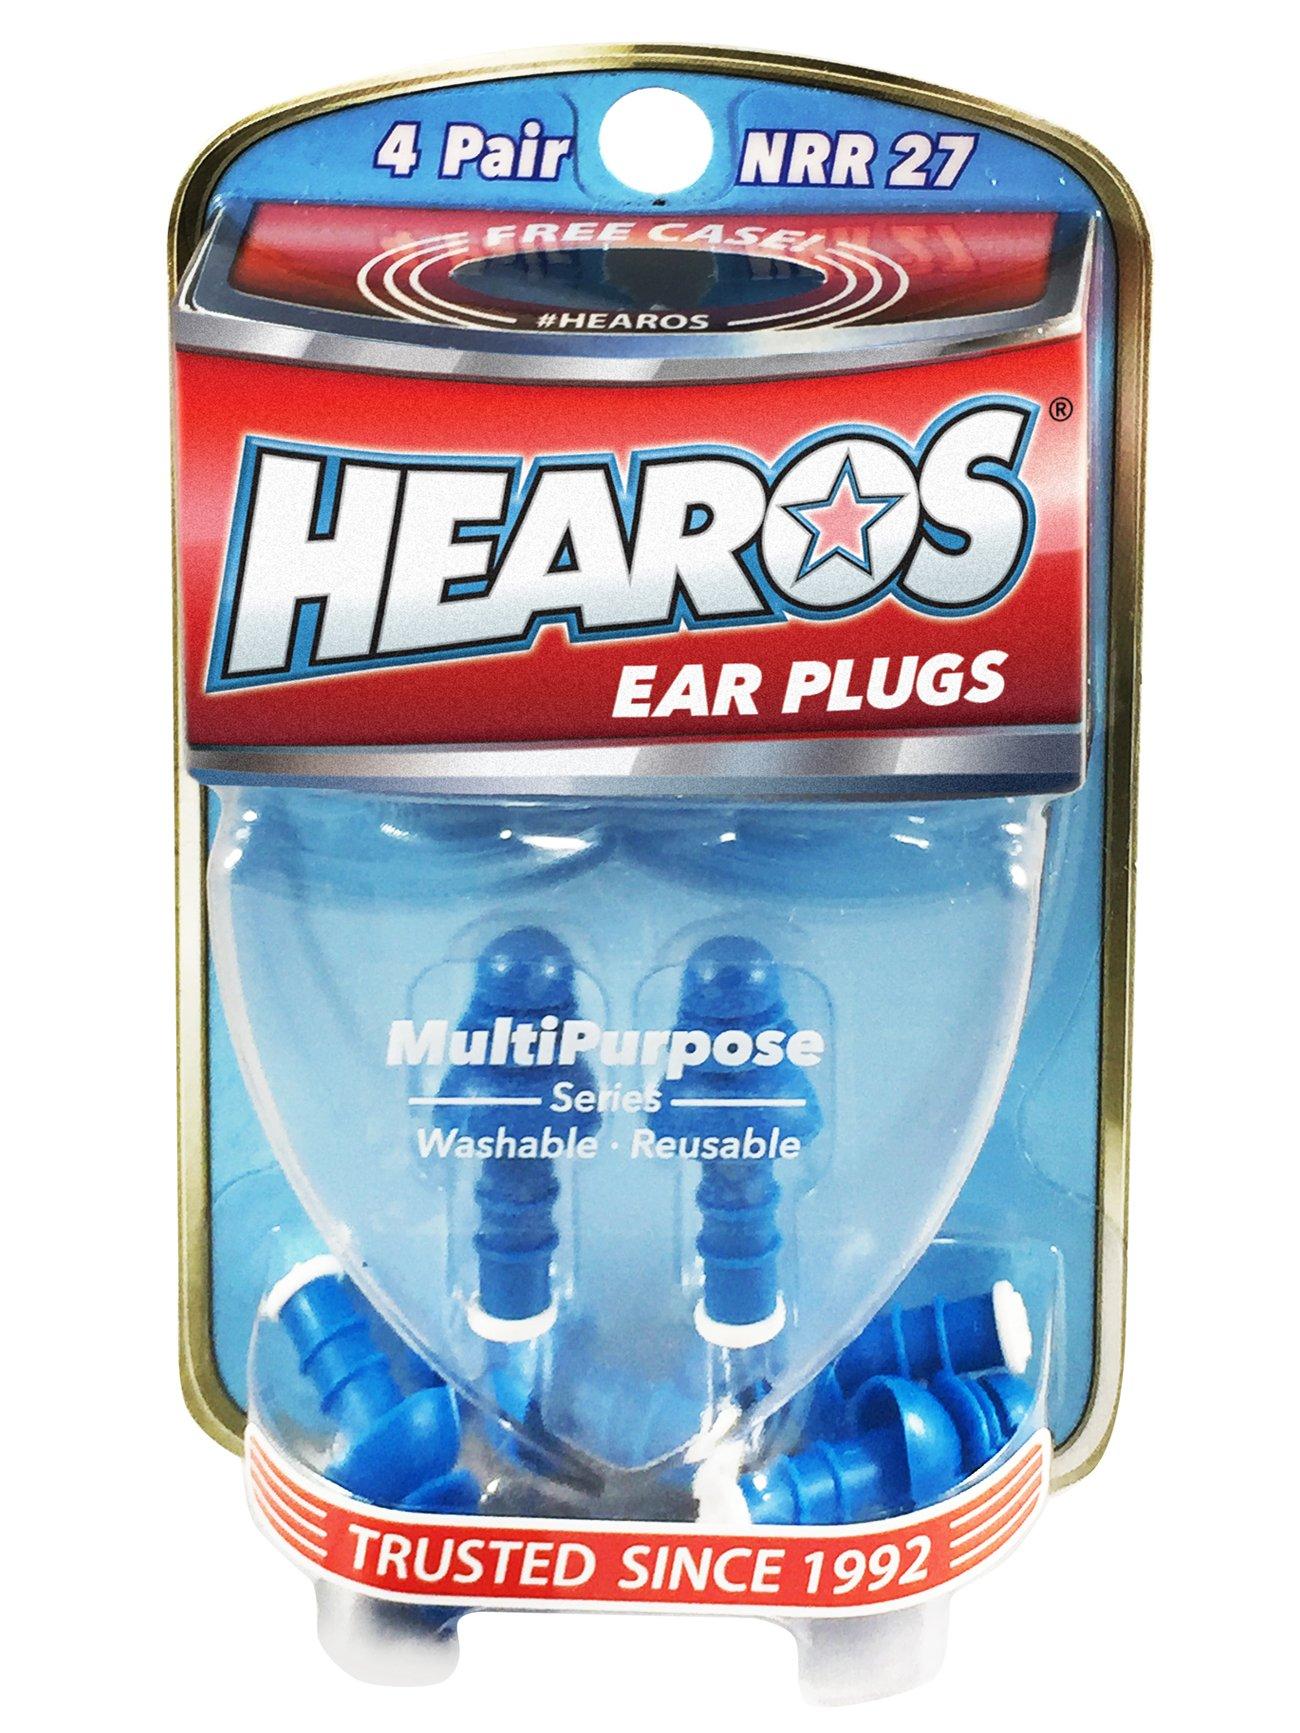 HEAROS Multi-Purpose Reusable Ear Plugs, 4 Pair, Free Case by Hearos